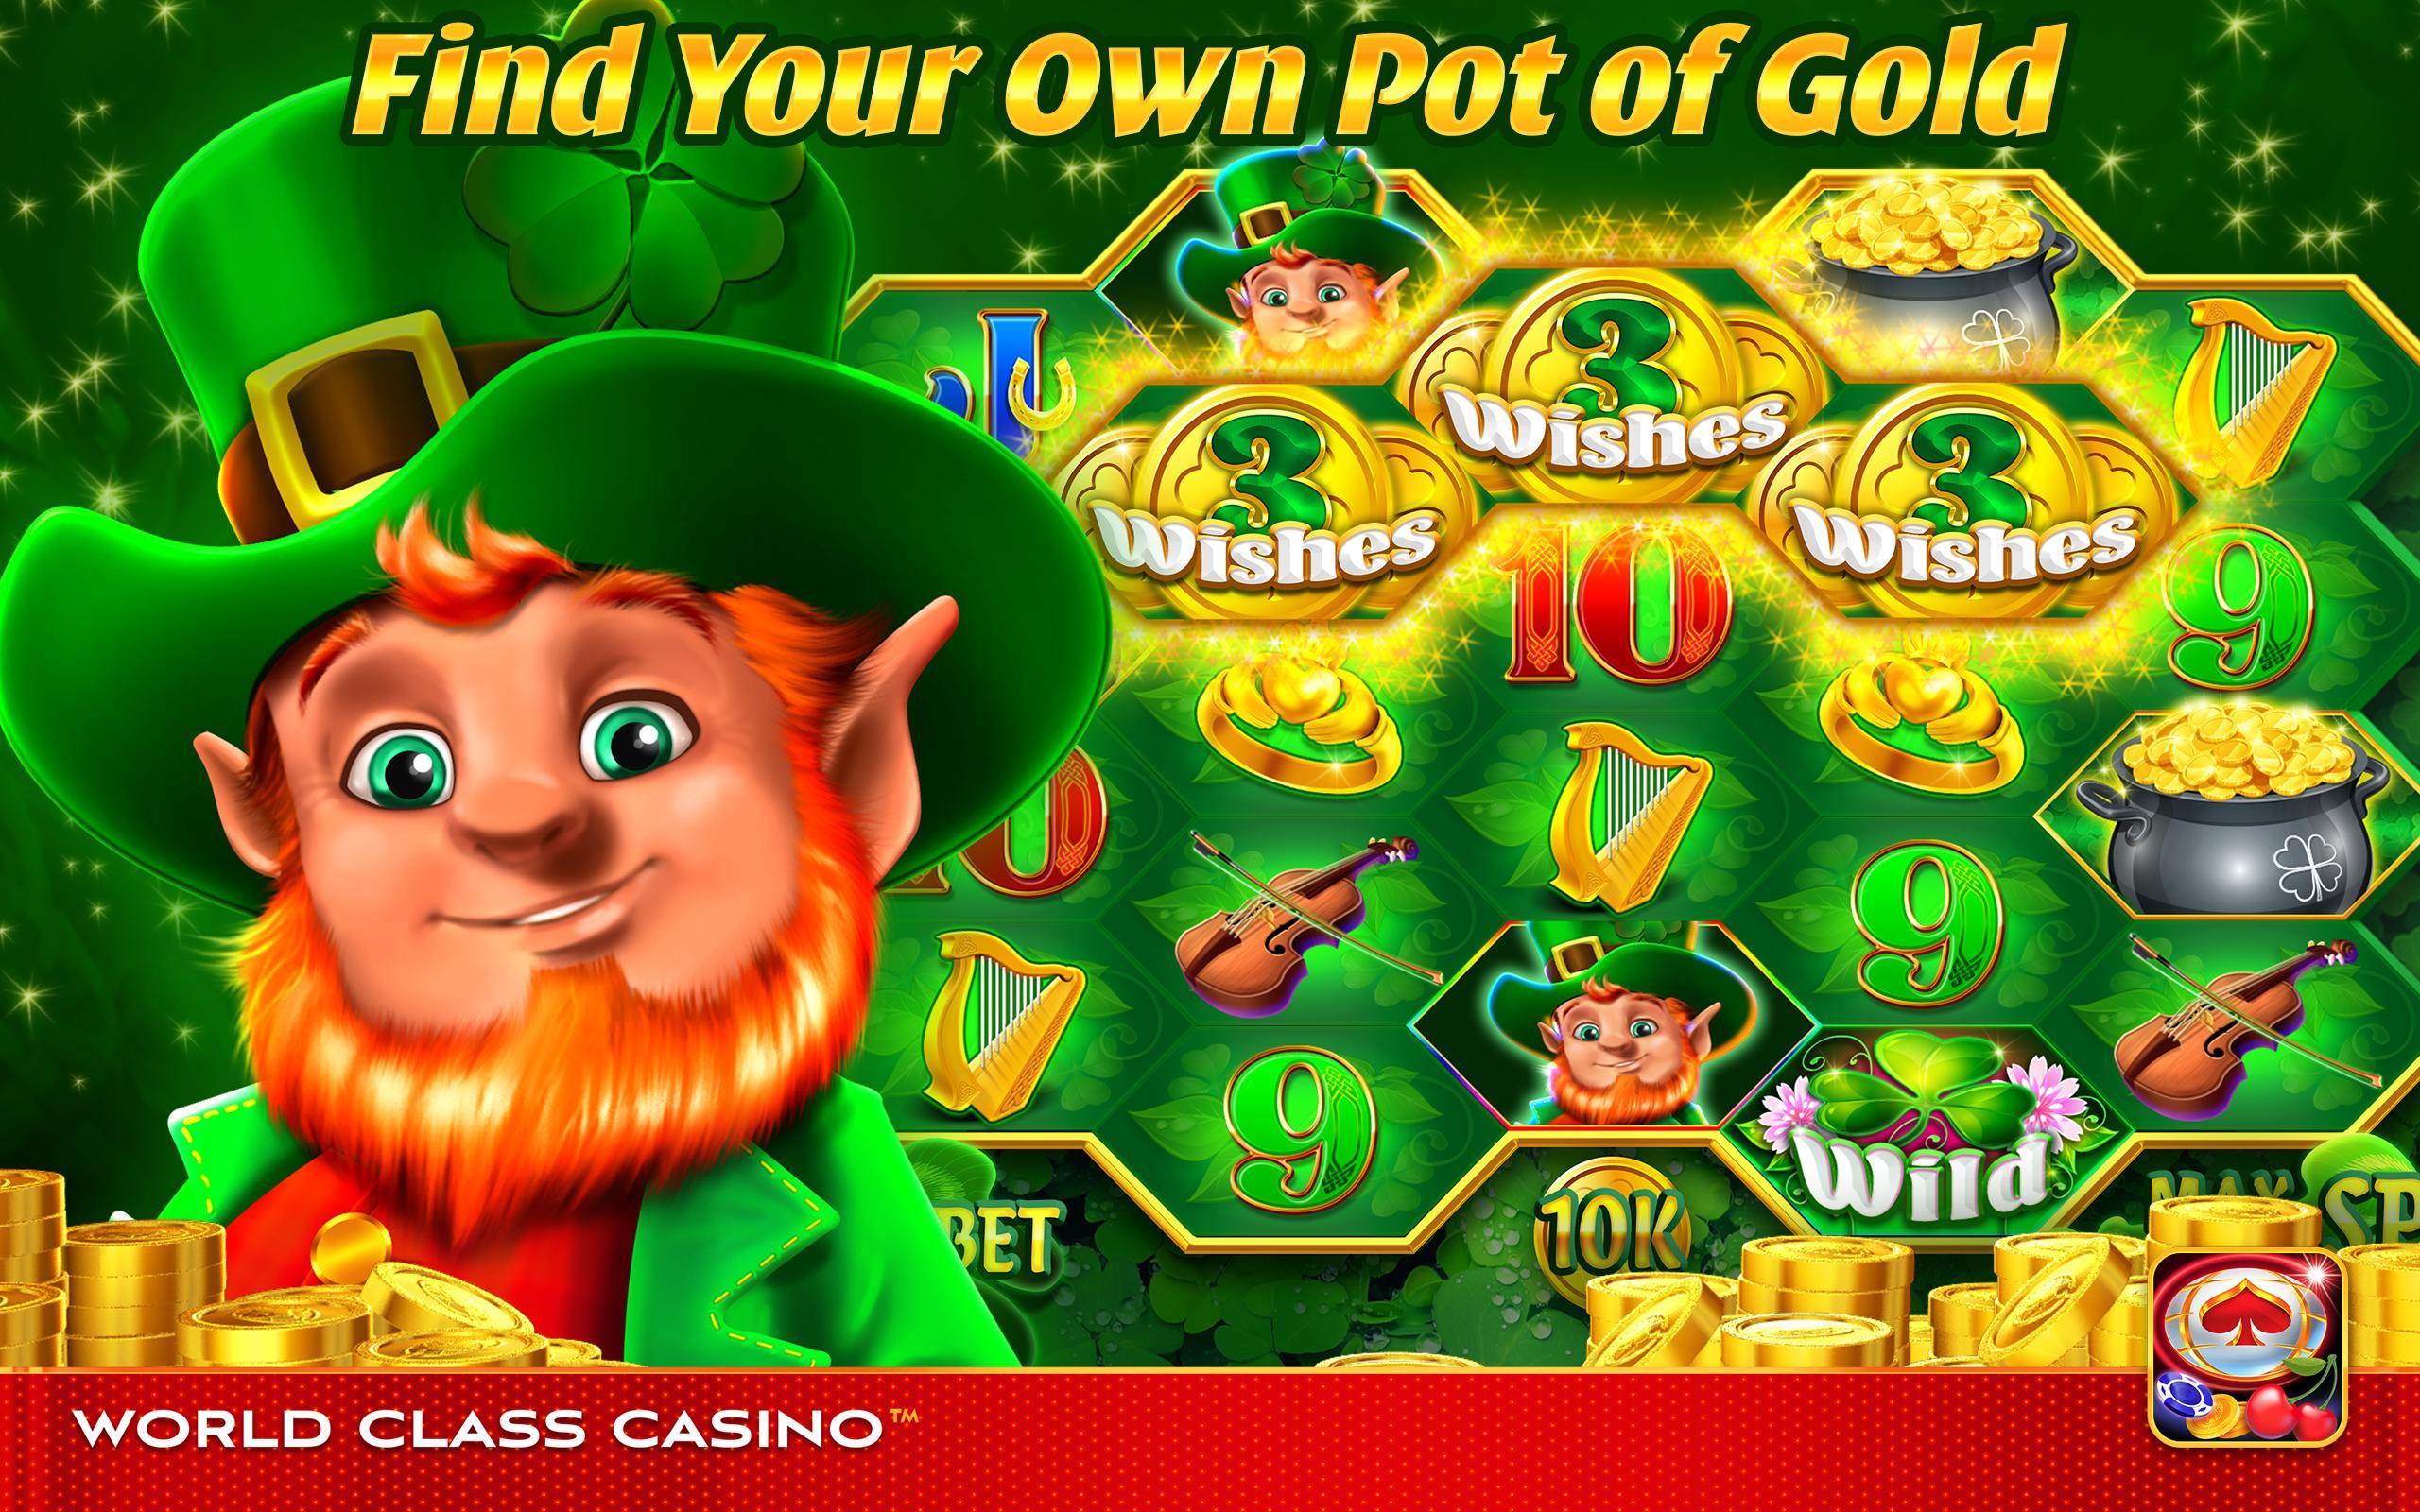 World Class Casino Slots, Blackjack & Poker Room 8.0.4 Screenshot 15